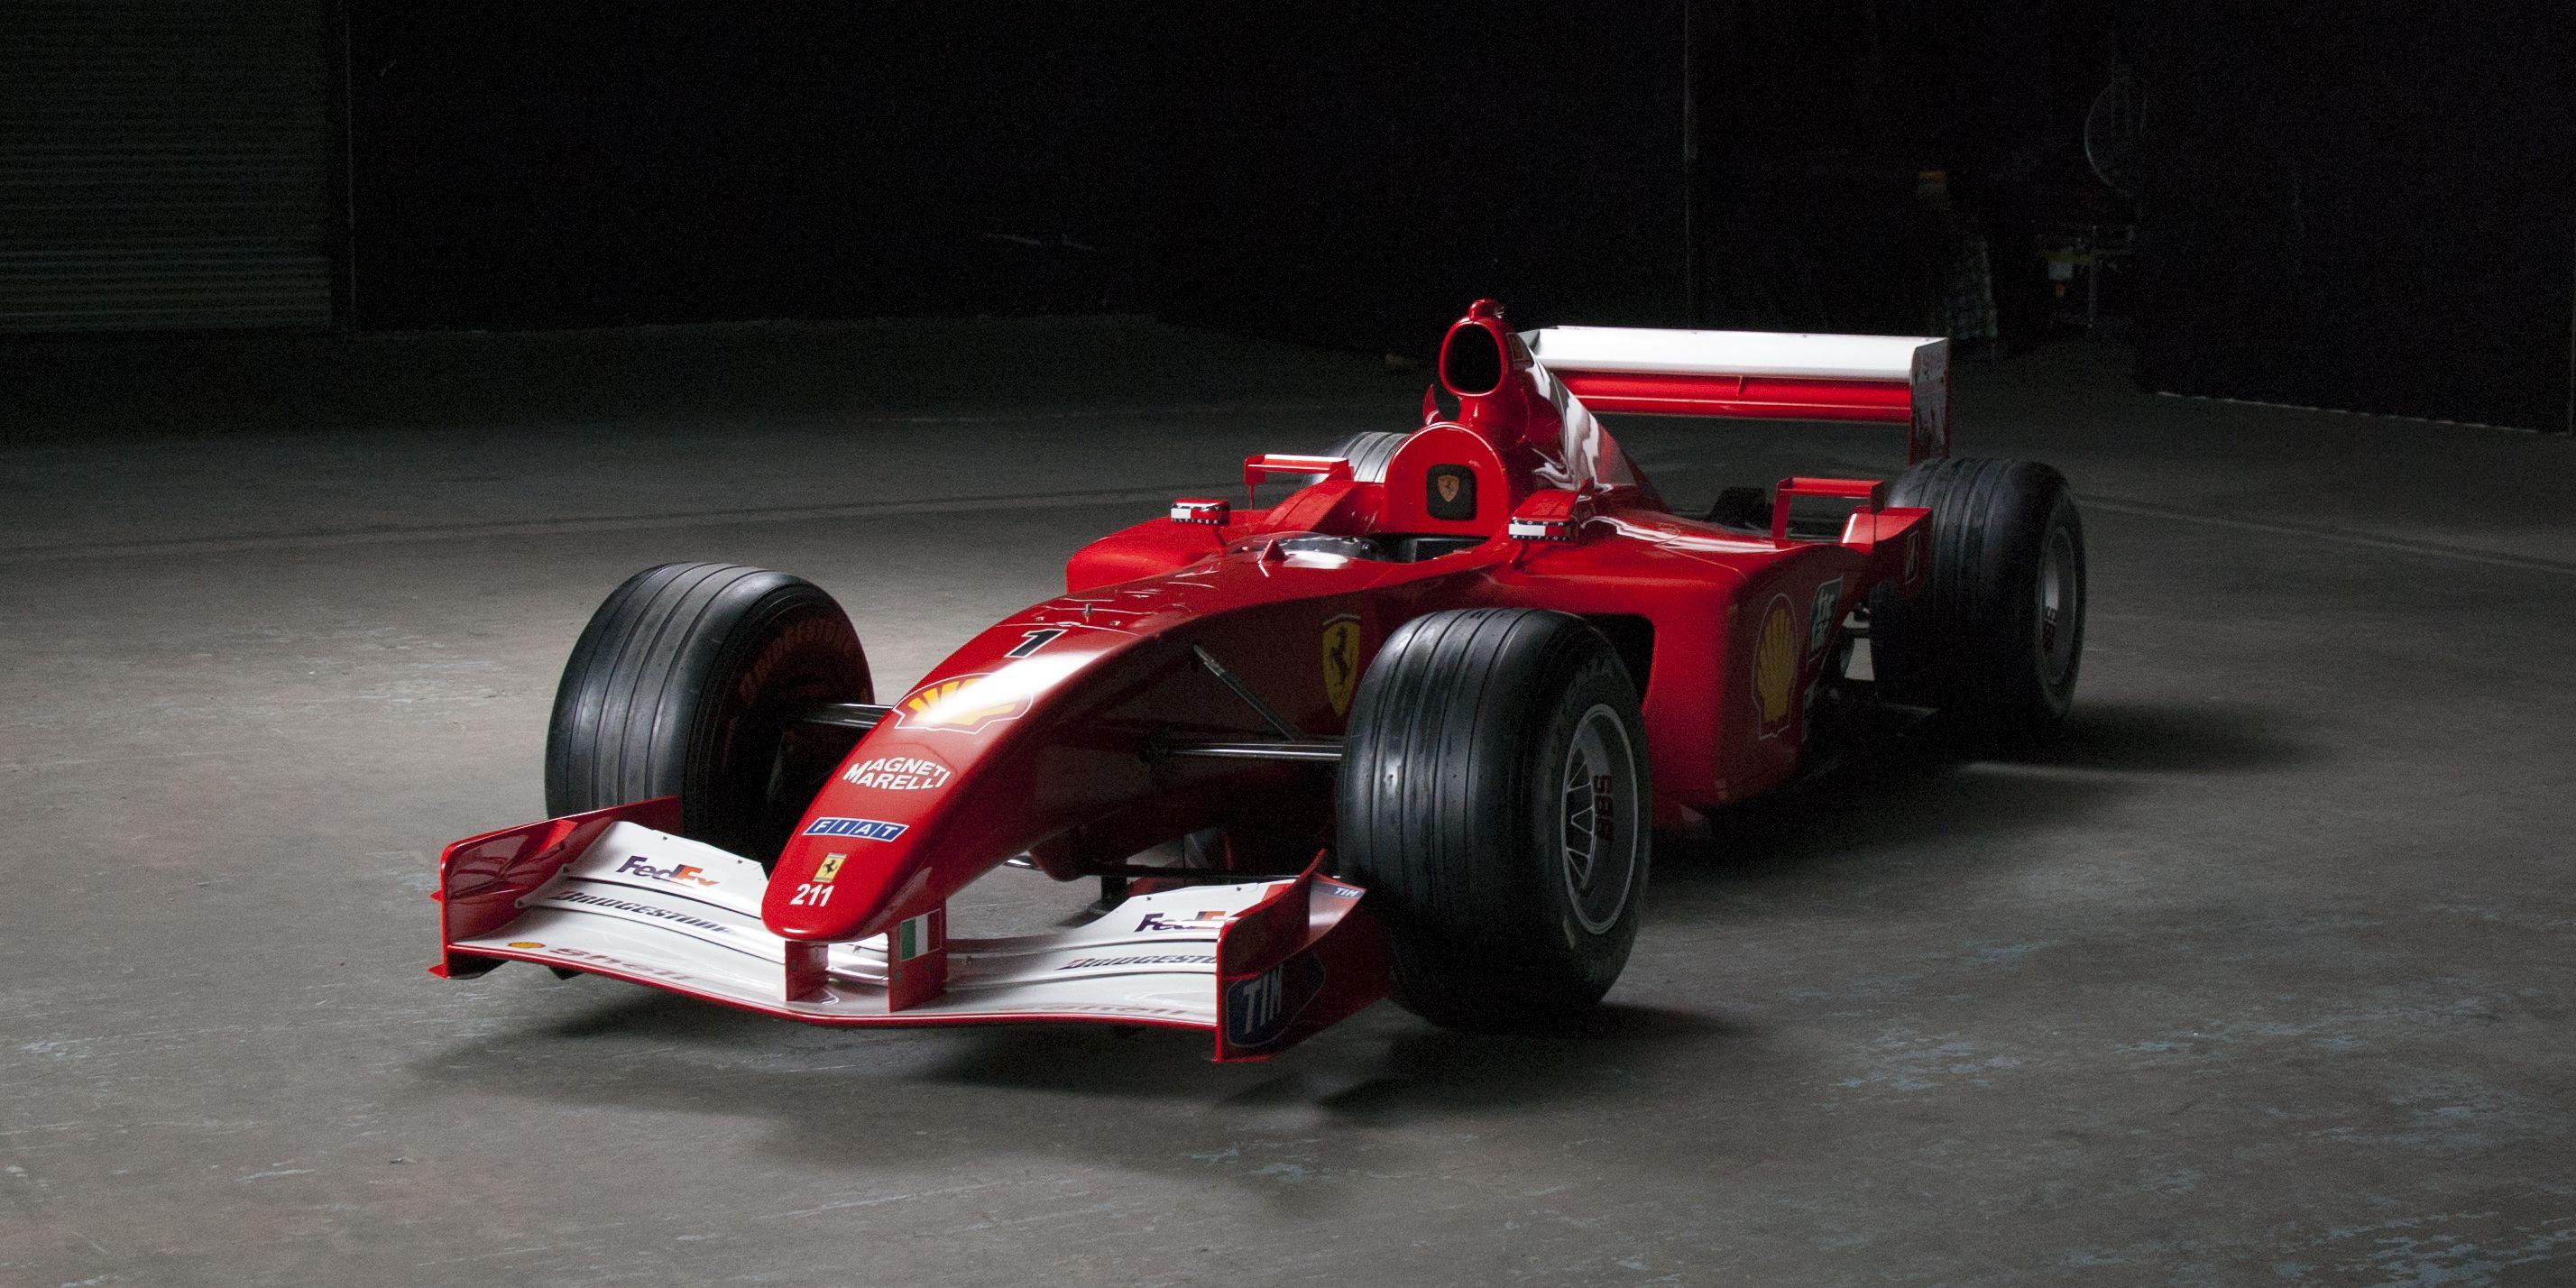 Michael Schumacher\'s F1 Car For Sale - Ferrari 2001 Championship Car ...